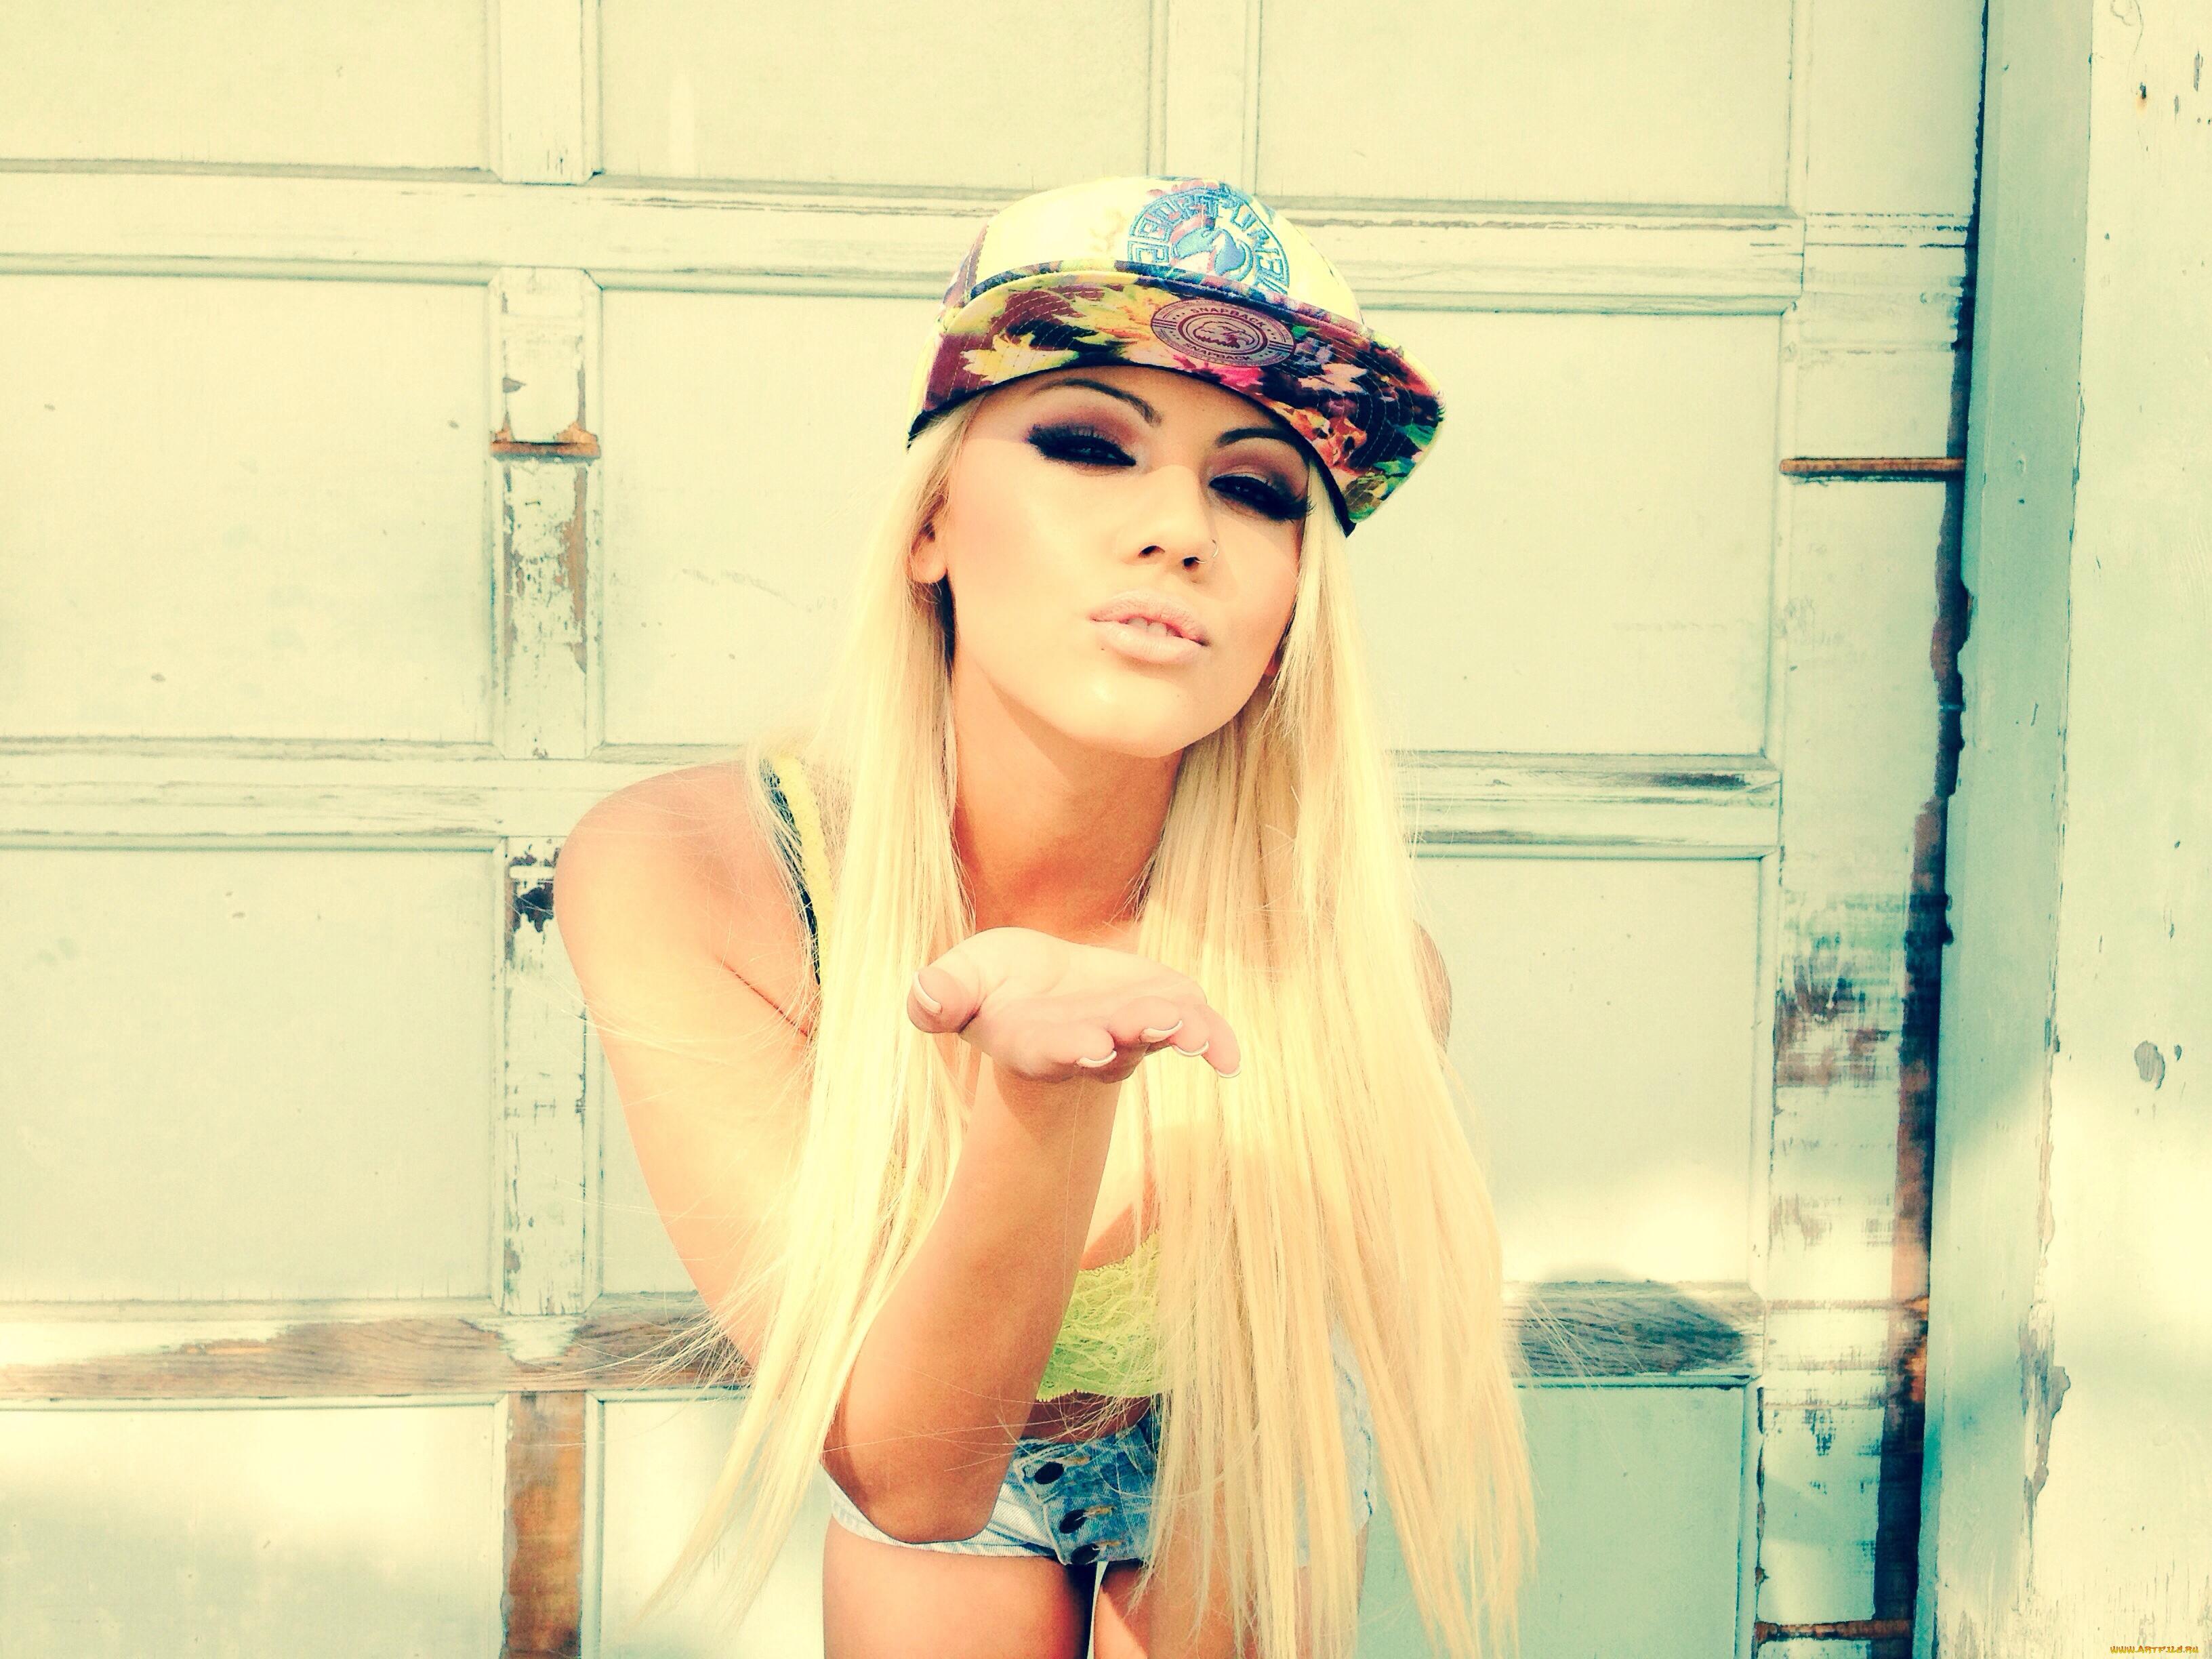 несмываемое, картинки клевых девчонок блондинок слышат, так